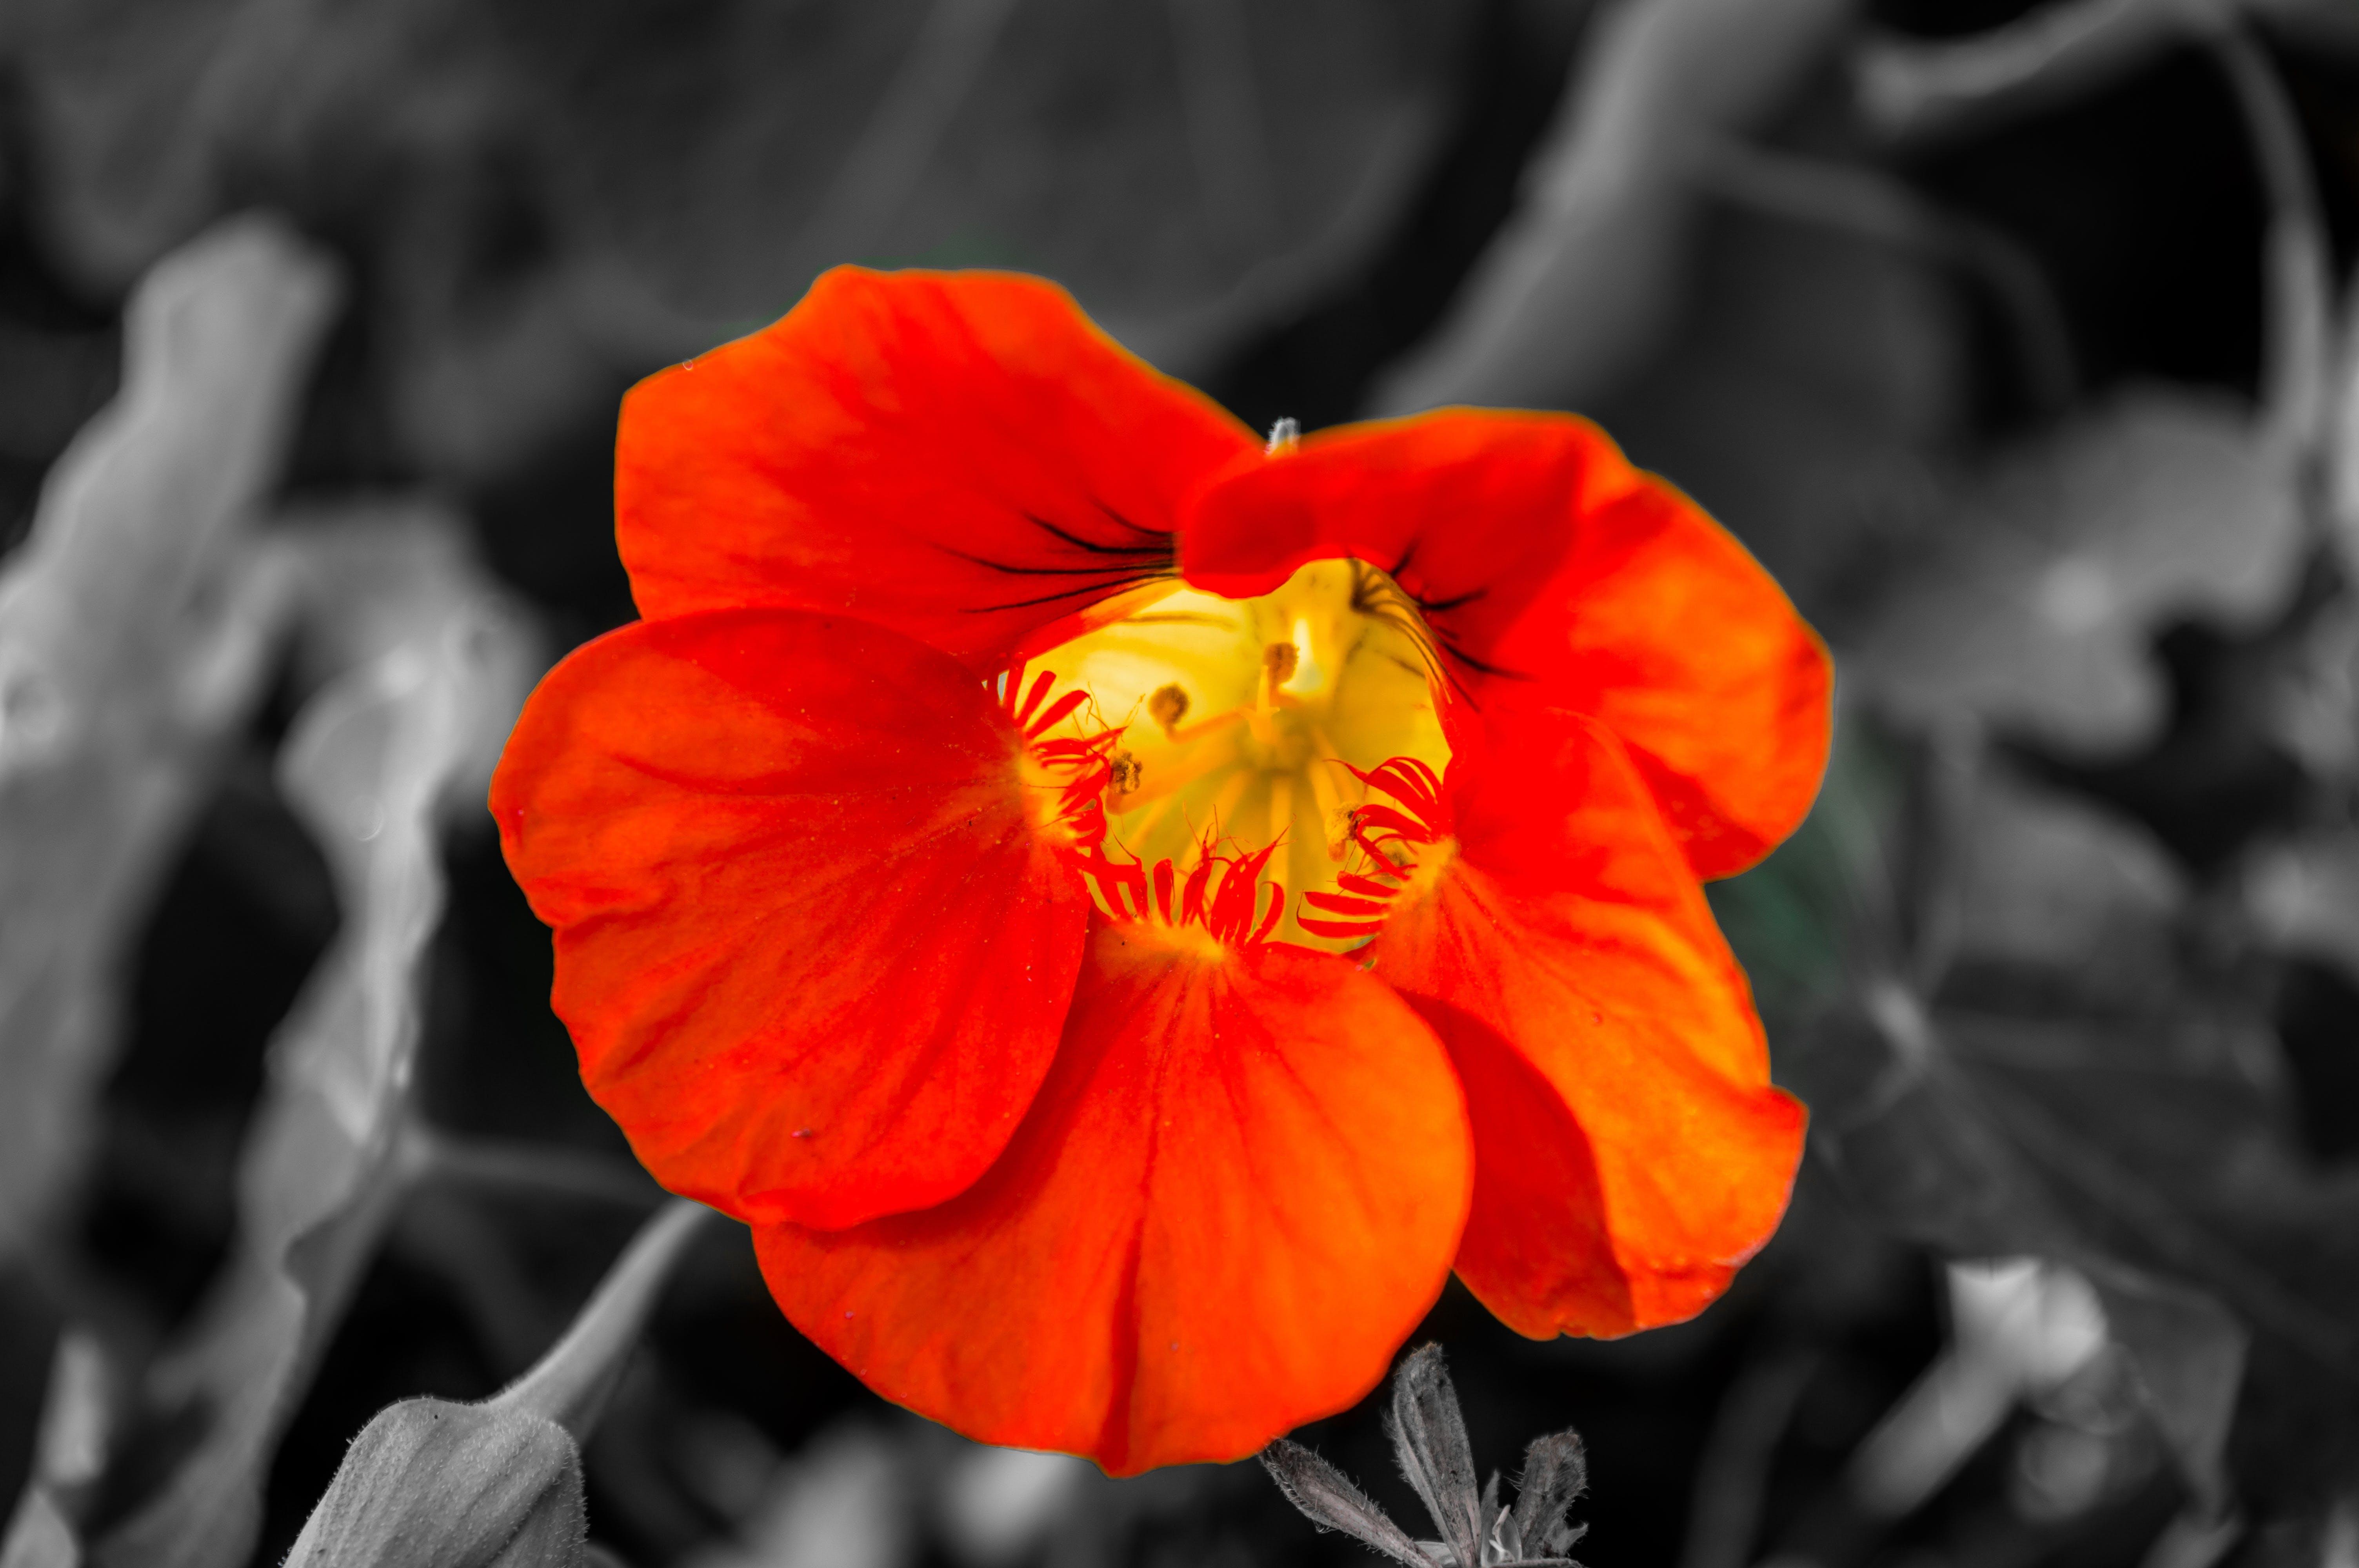 Selective Color Photo of Orange Poppy Flower